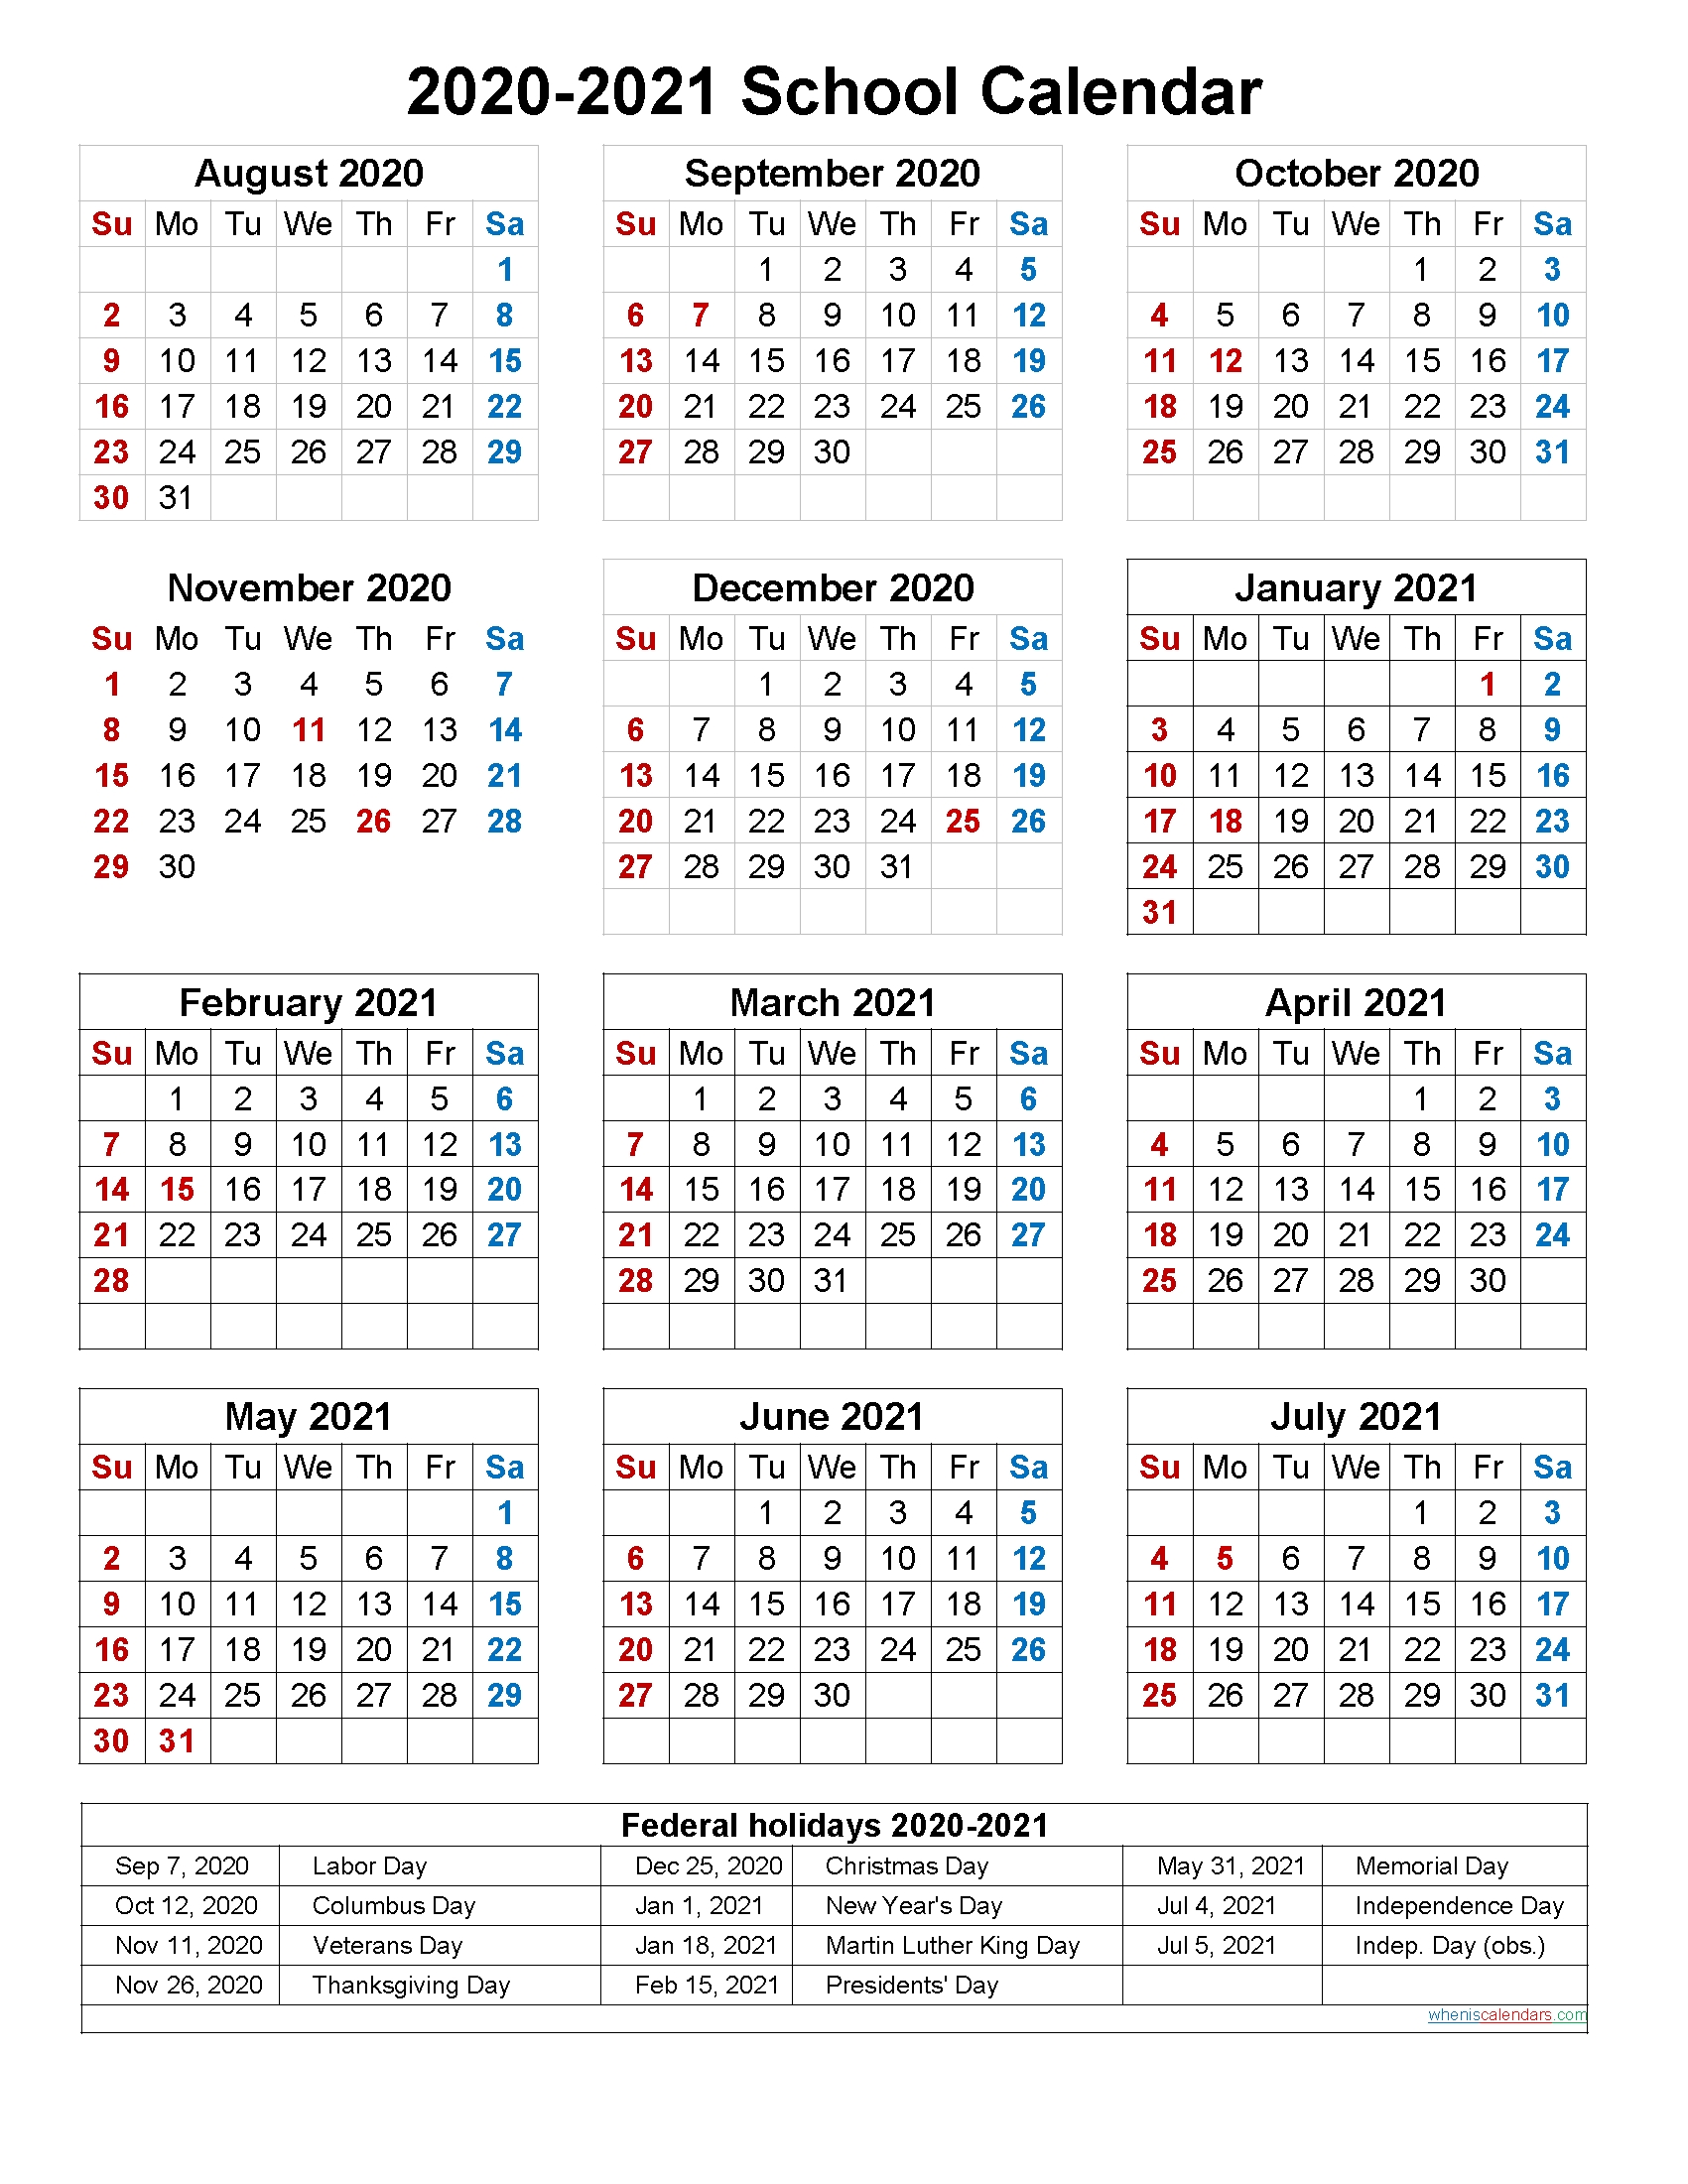 Printable 2020 2021 School Calendar | Printable Calendar